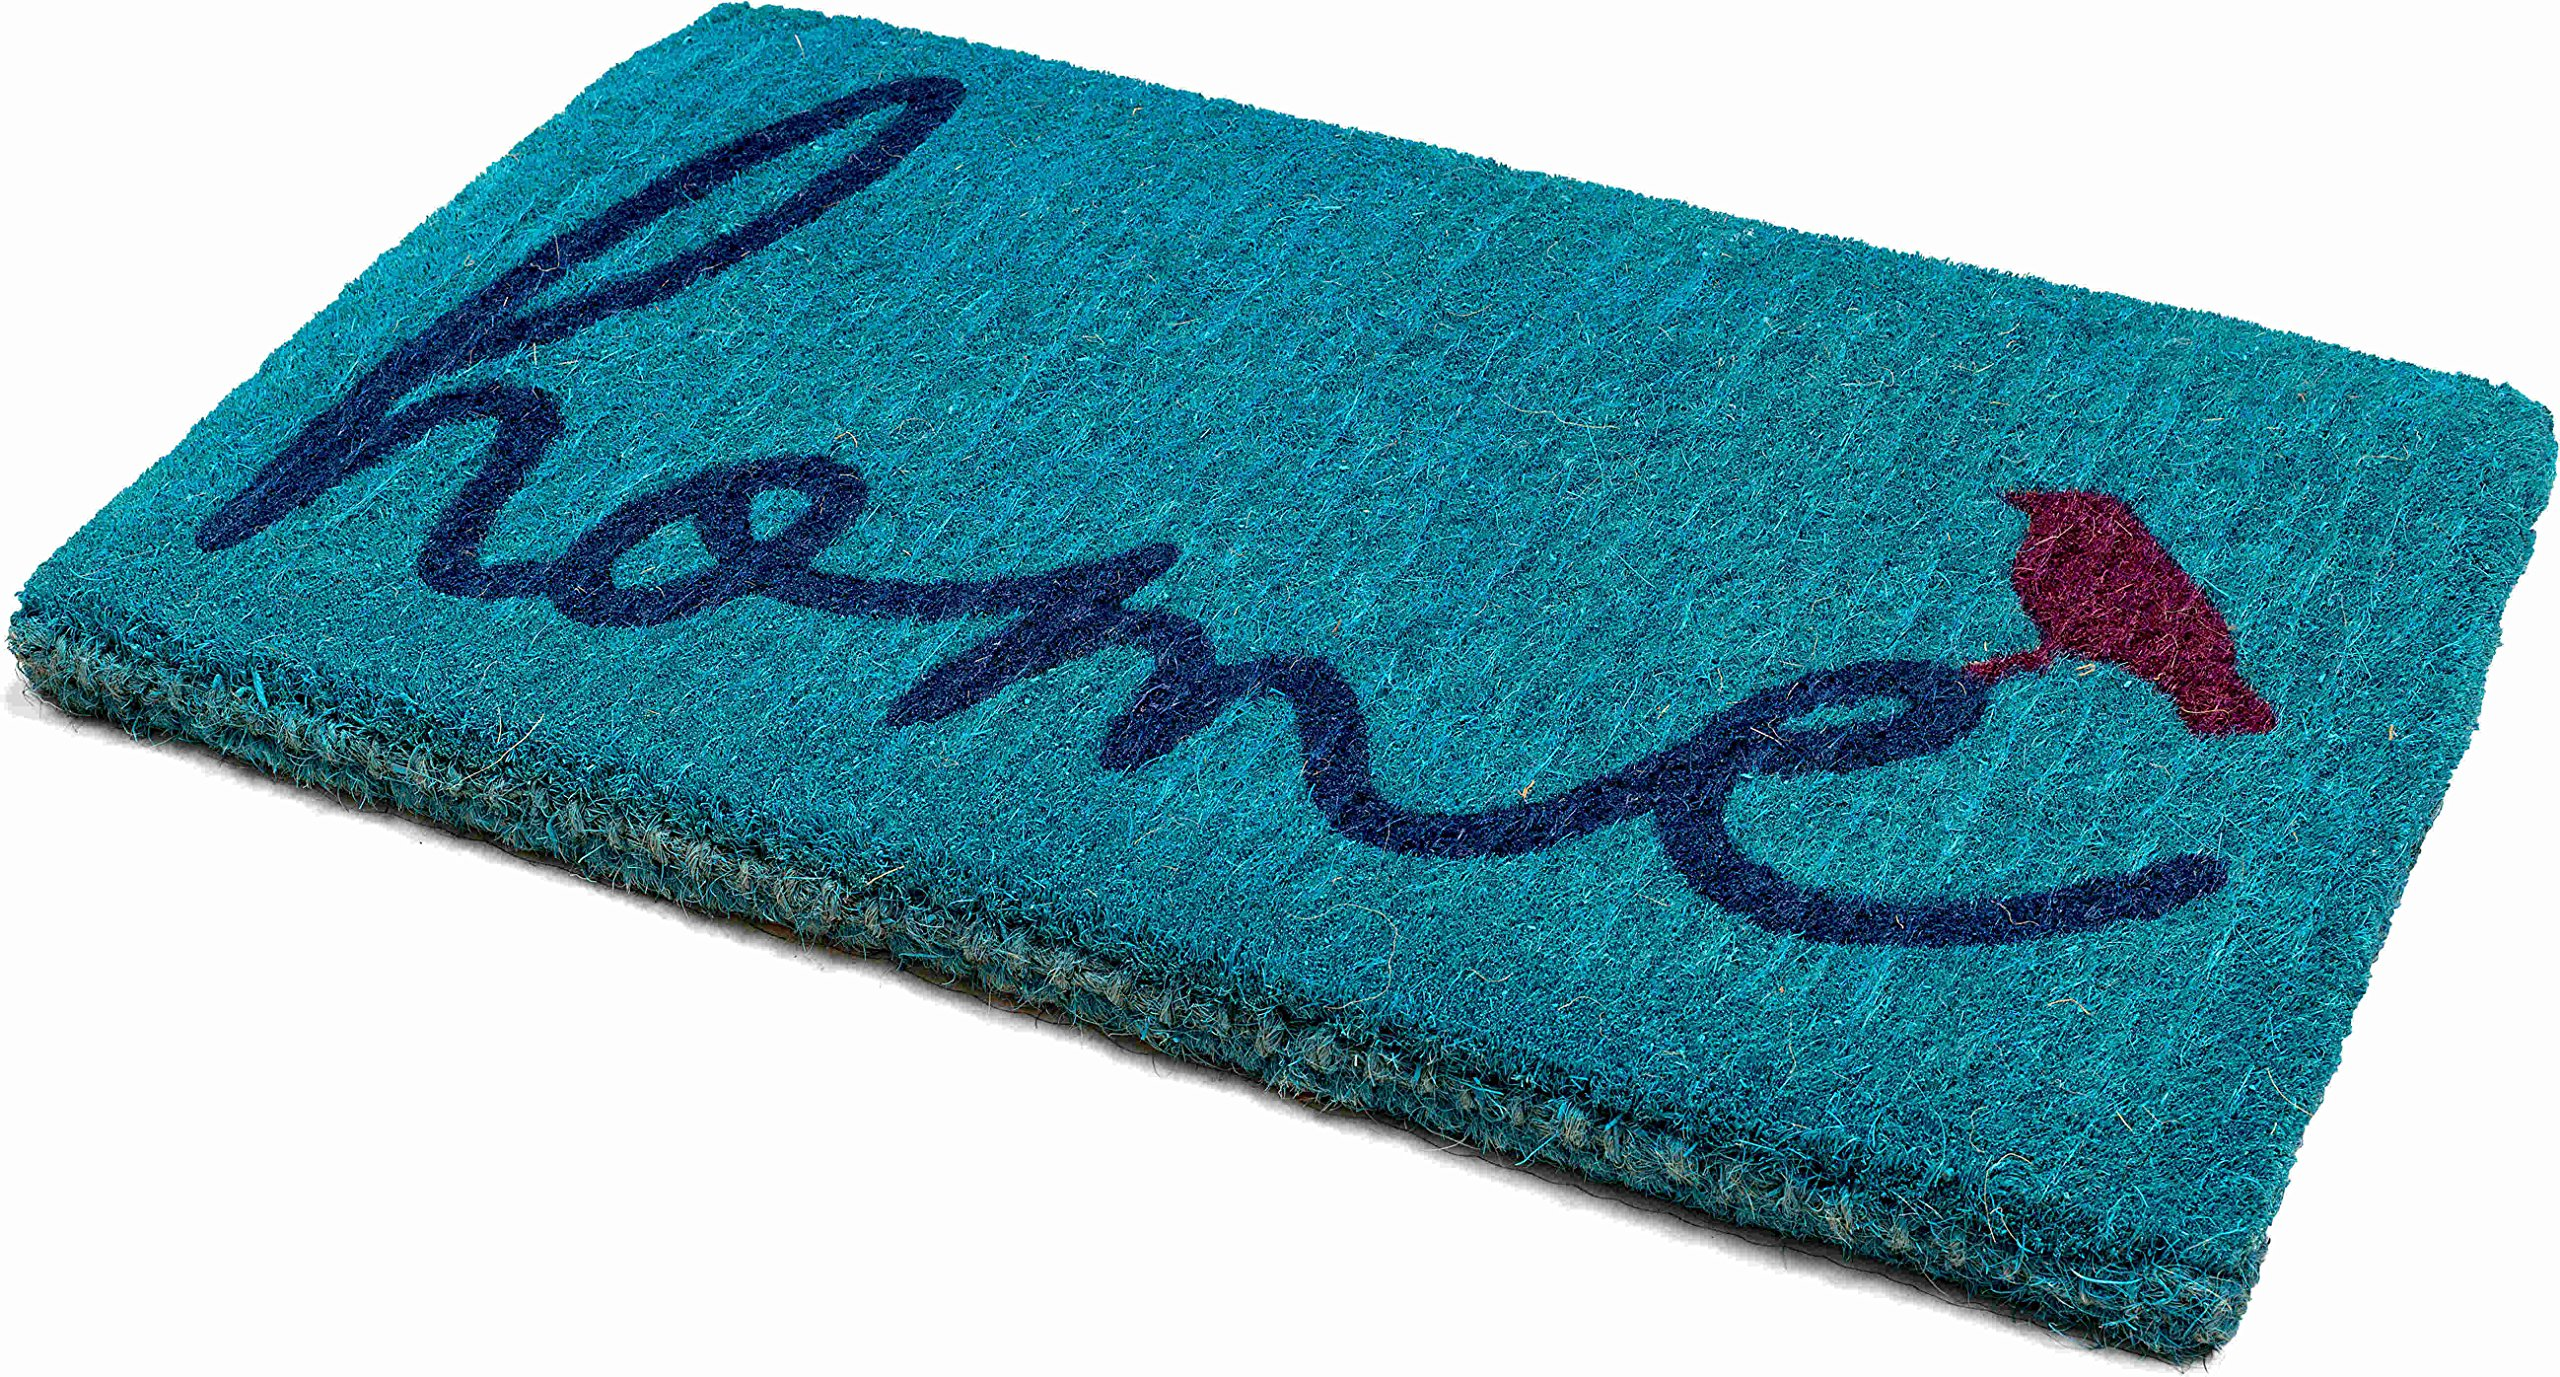 Handwoven, Extra Thick Doormat | Entryway Door mat For Patio, Front Door | Decorative All-Season | A Bird Perched on Home | 18'' x 30'' x 1.60''